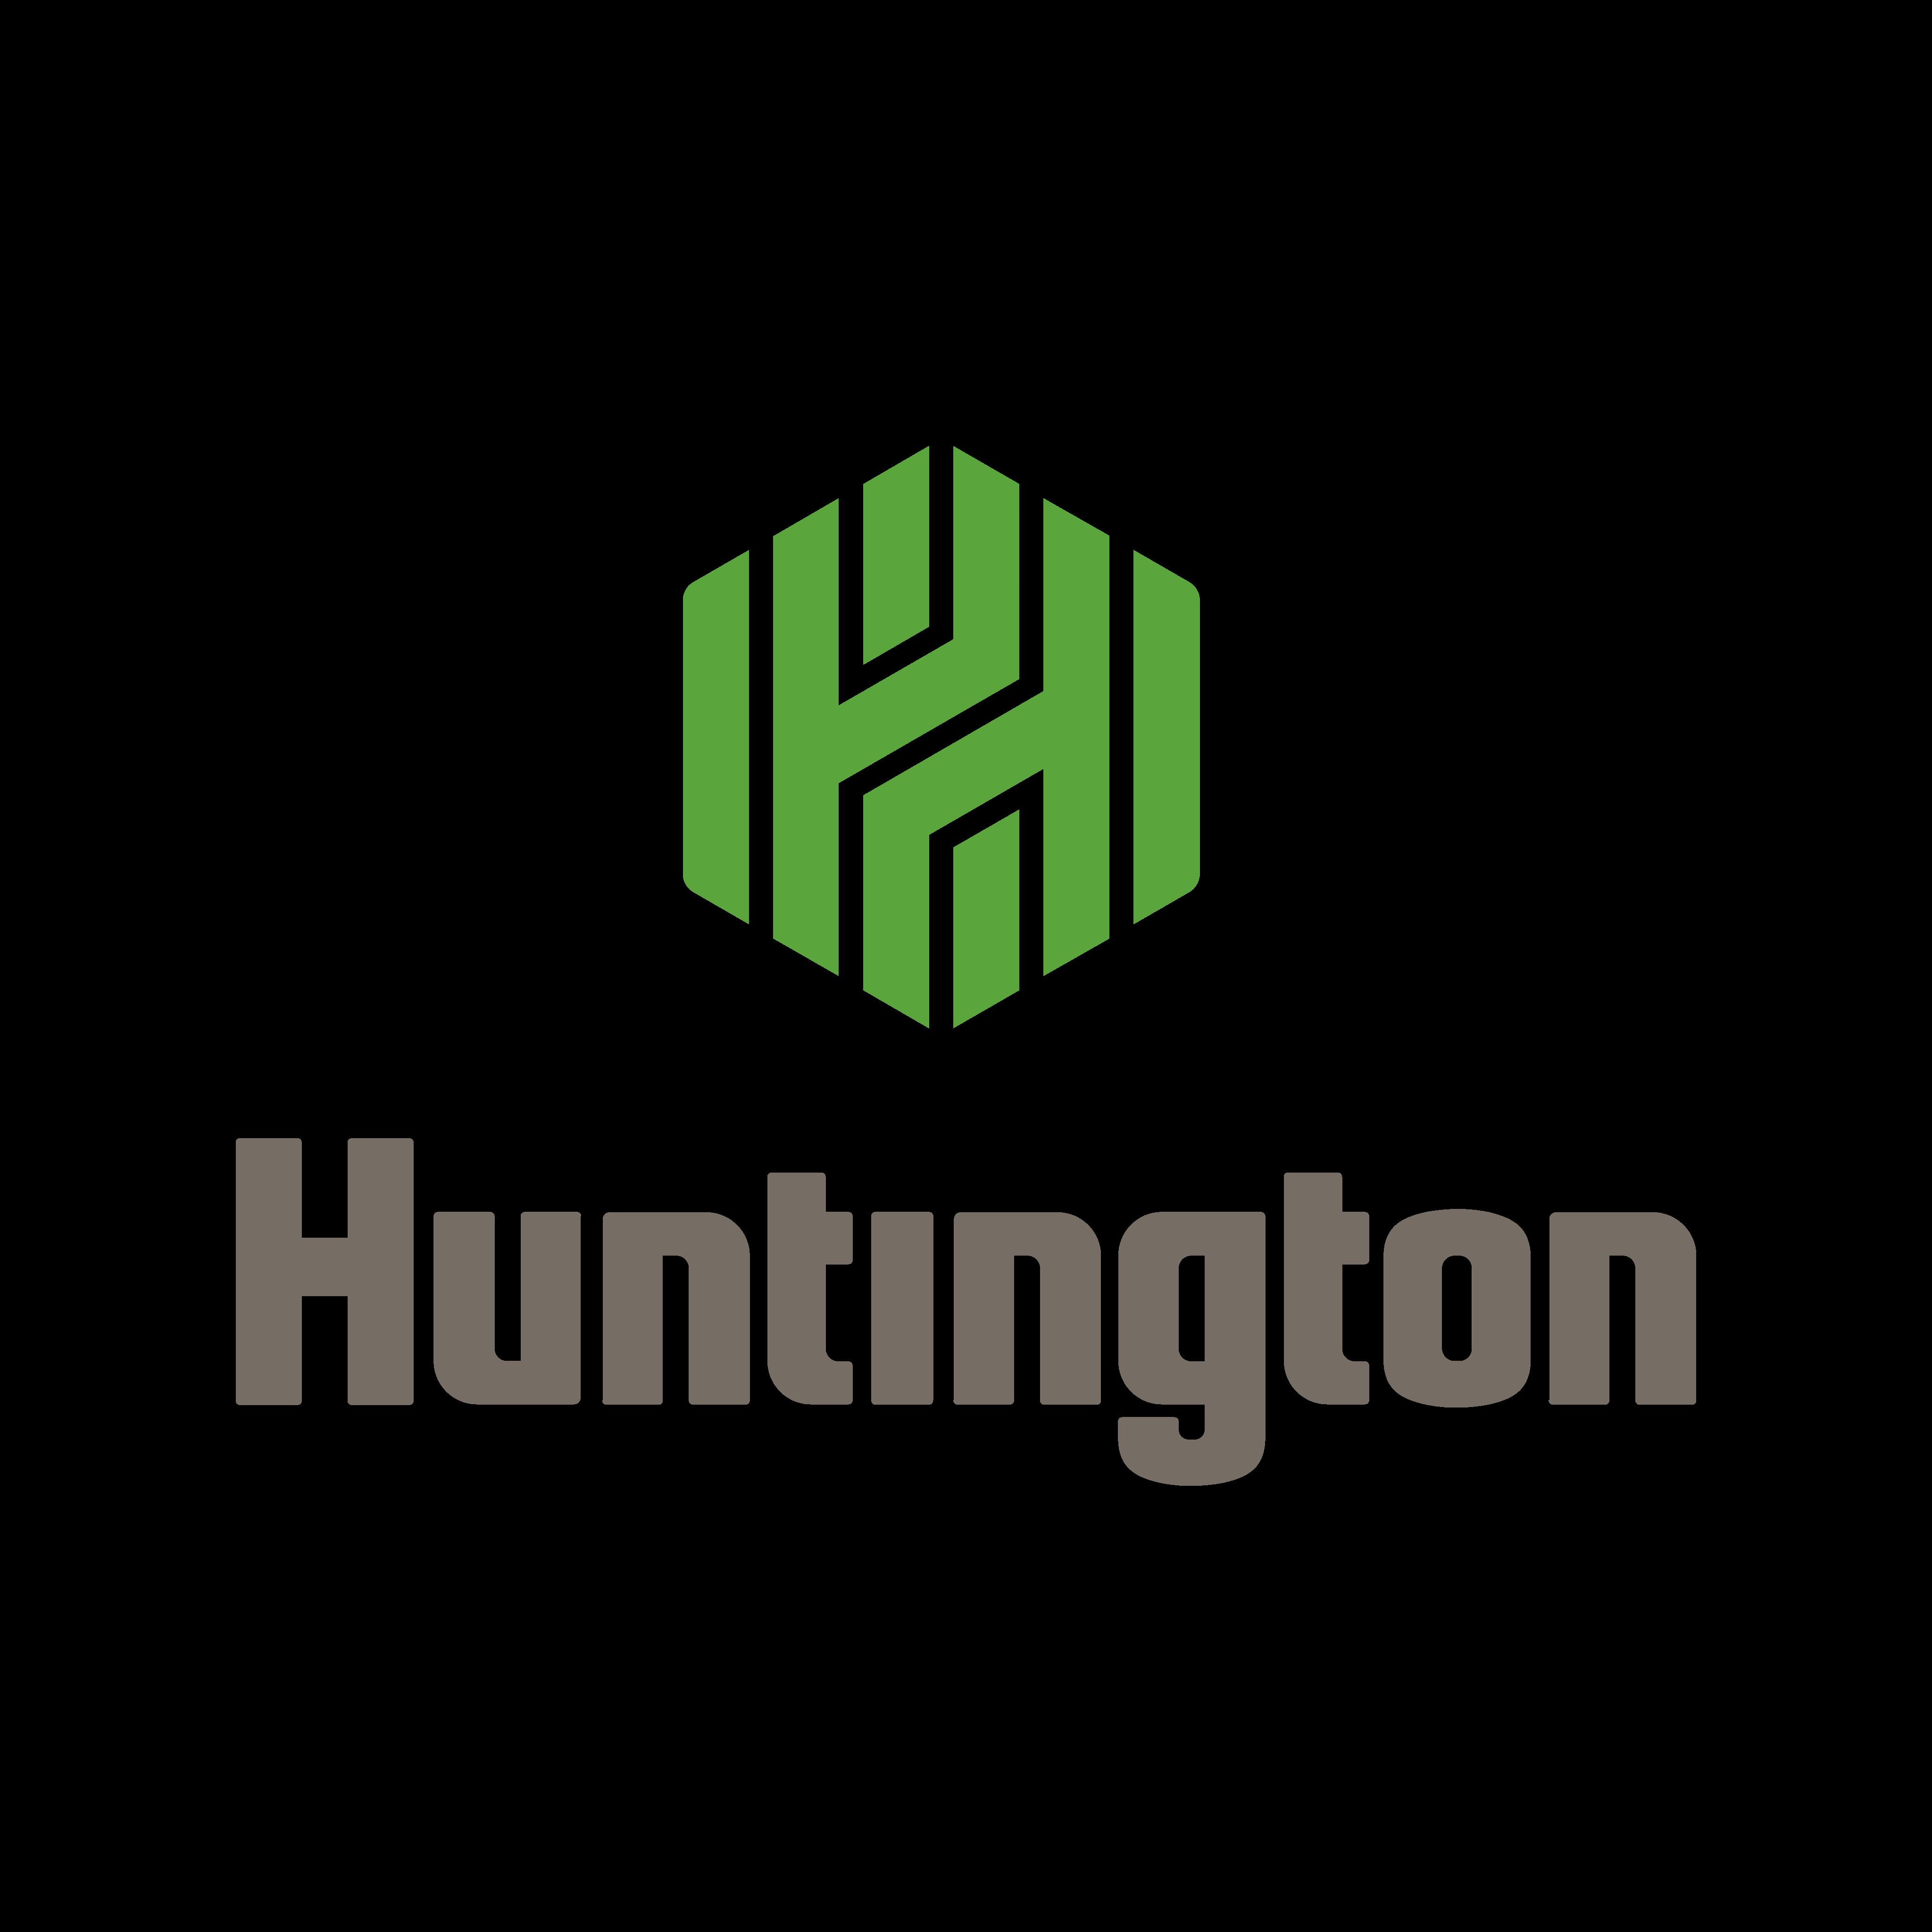 huntington bank logo 0 - Huntington Bank Logo